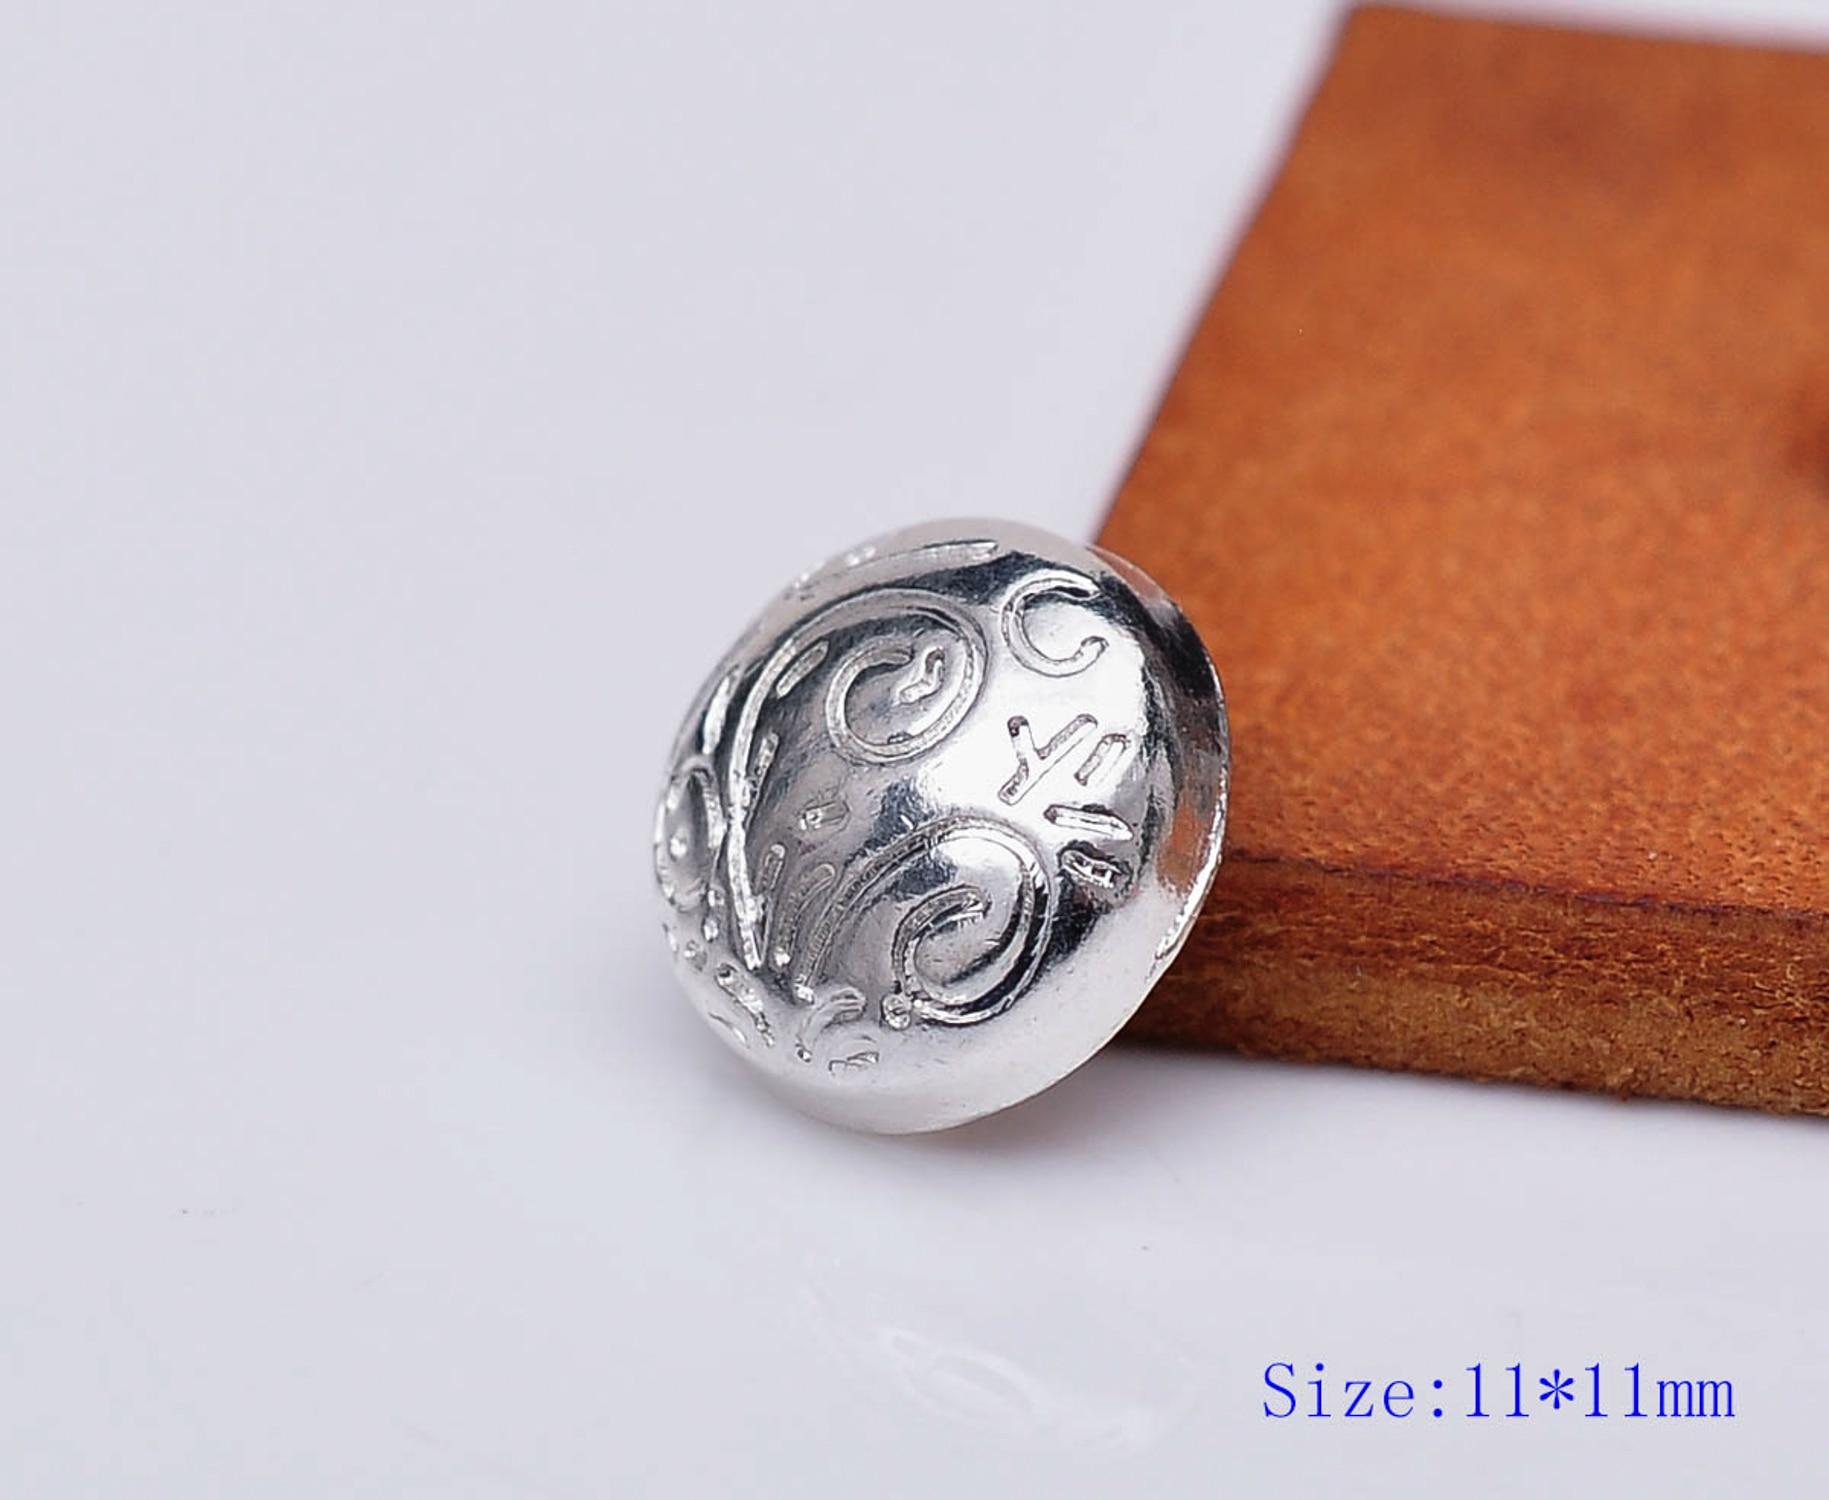 30x Antique Silver Flower Rapid Rivet Studs Belt Bag Leathercraft Concho 11mm